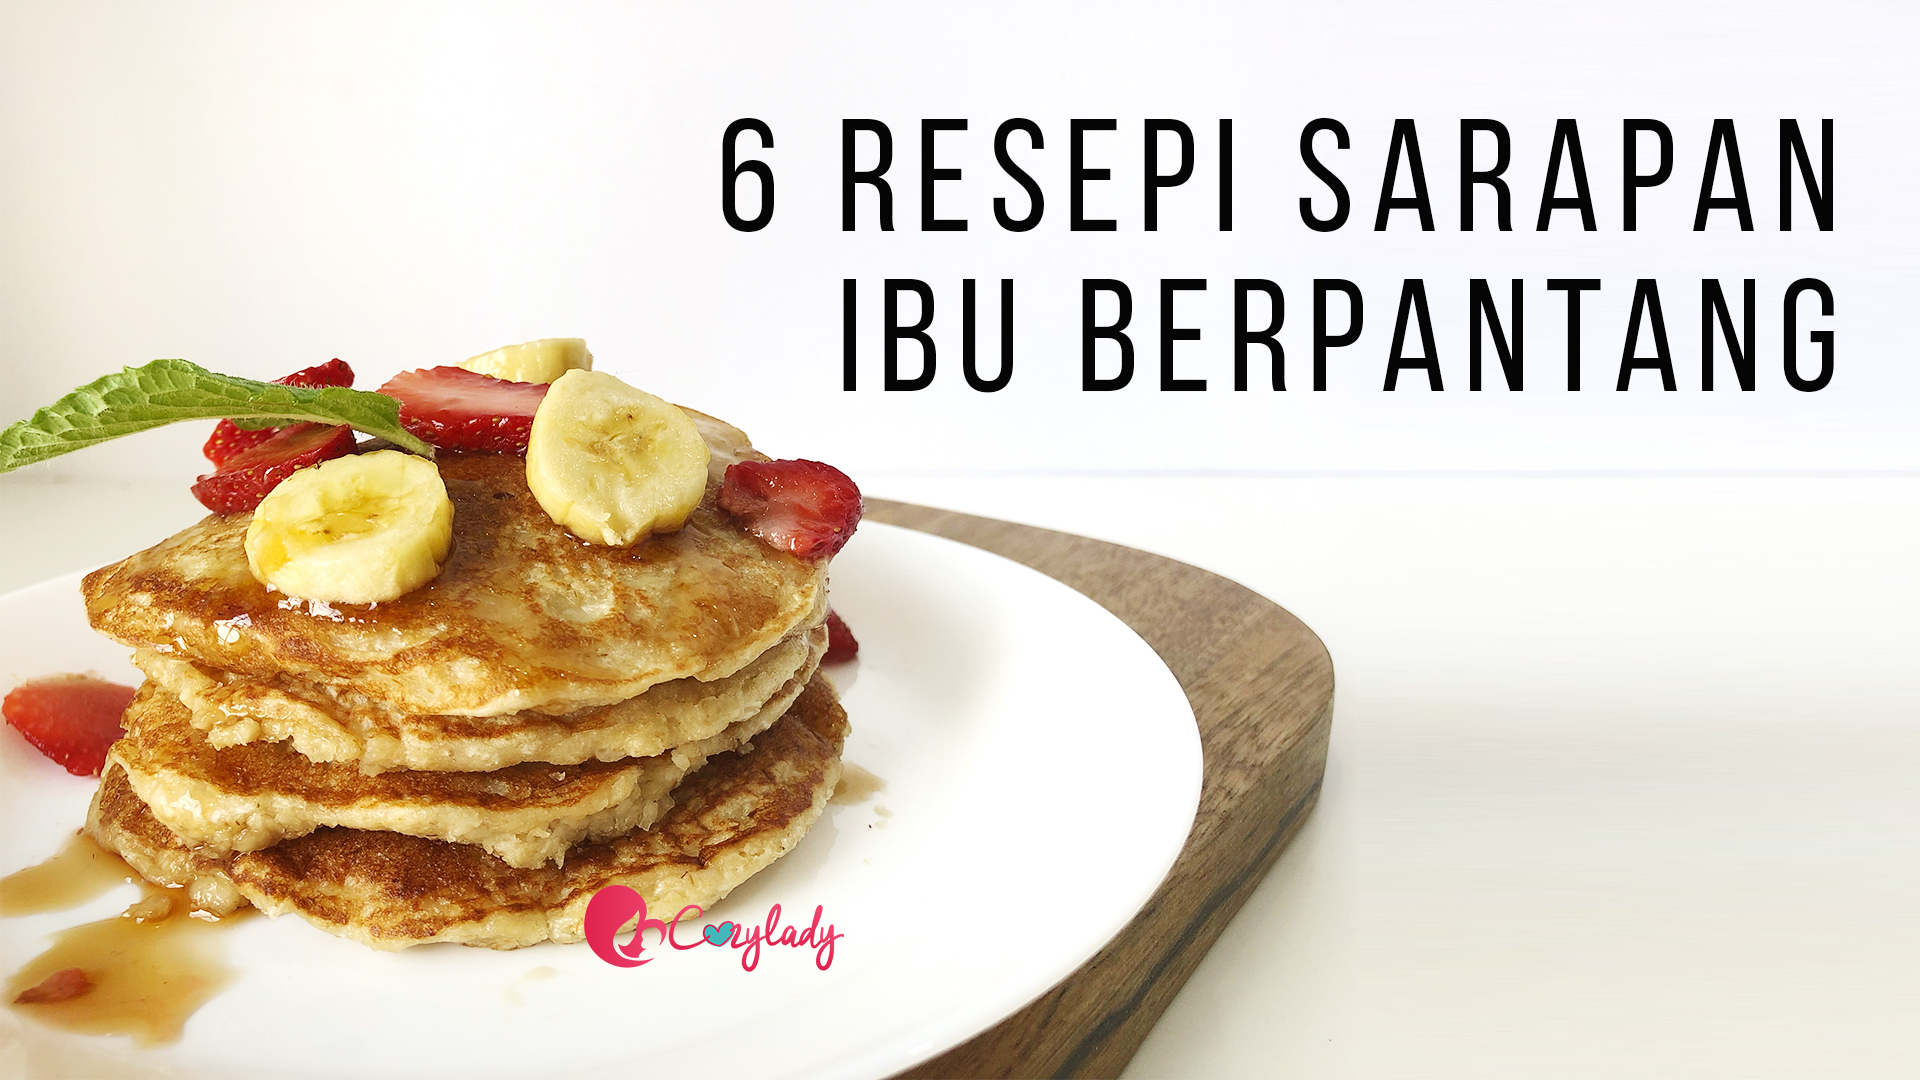 6 resepi sarapan pantang